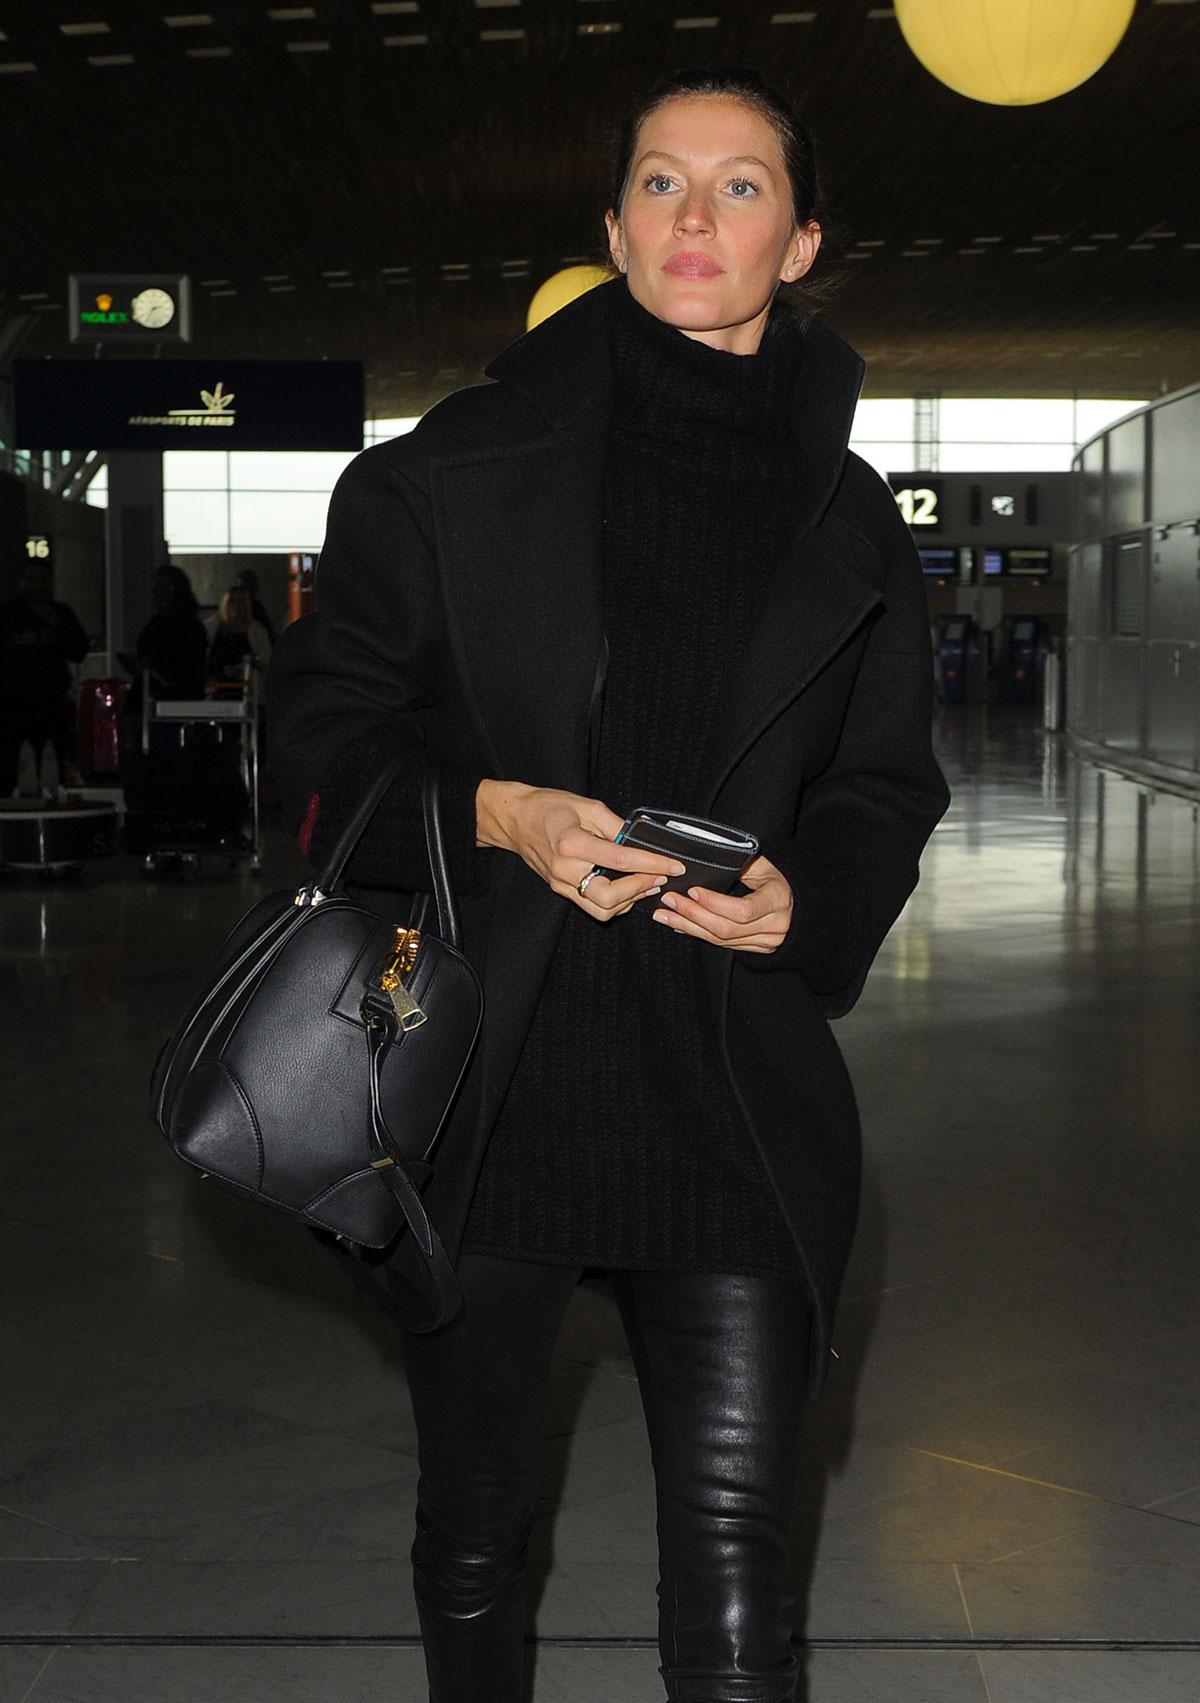 Gisele Bundchen at Charles De Gaulle Airport